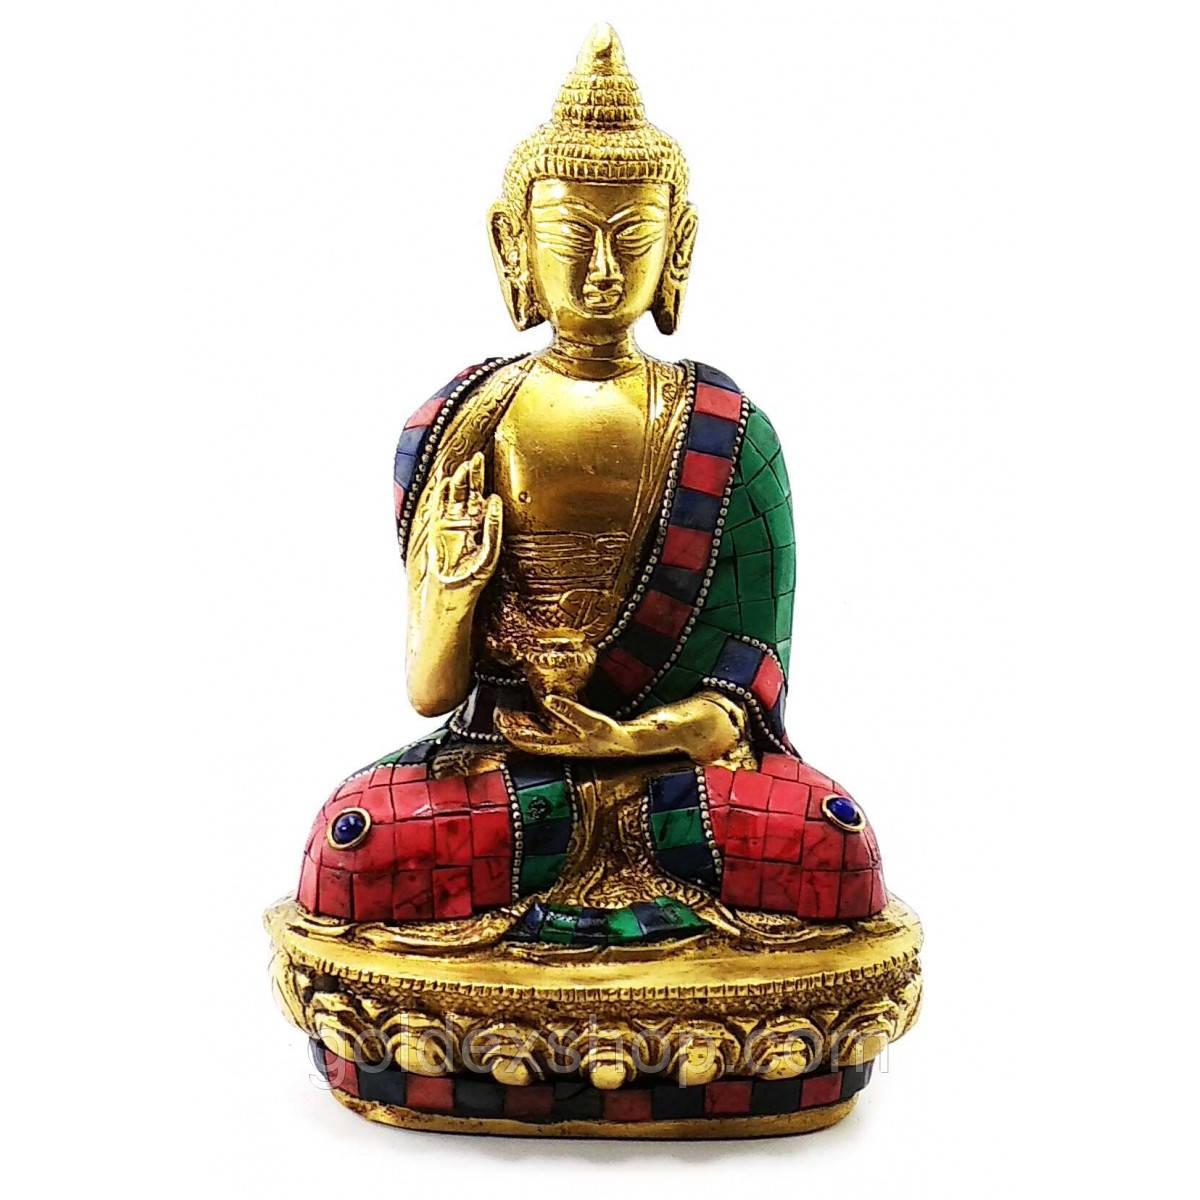 Статуэтка Будды из бронзы бирюза, кораллы (Высота 21 см)